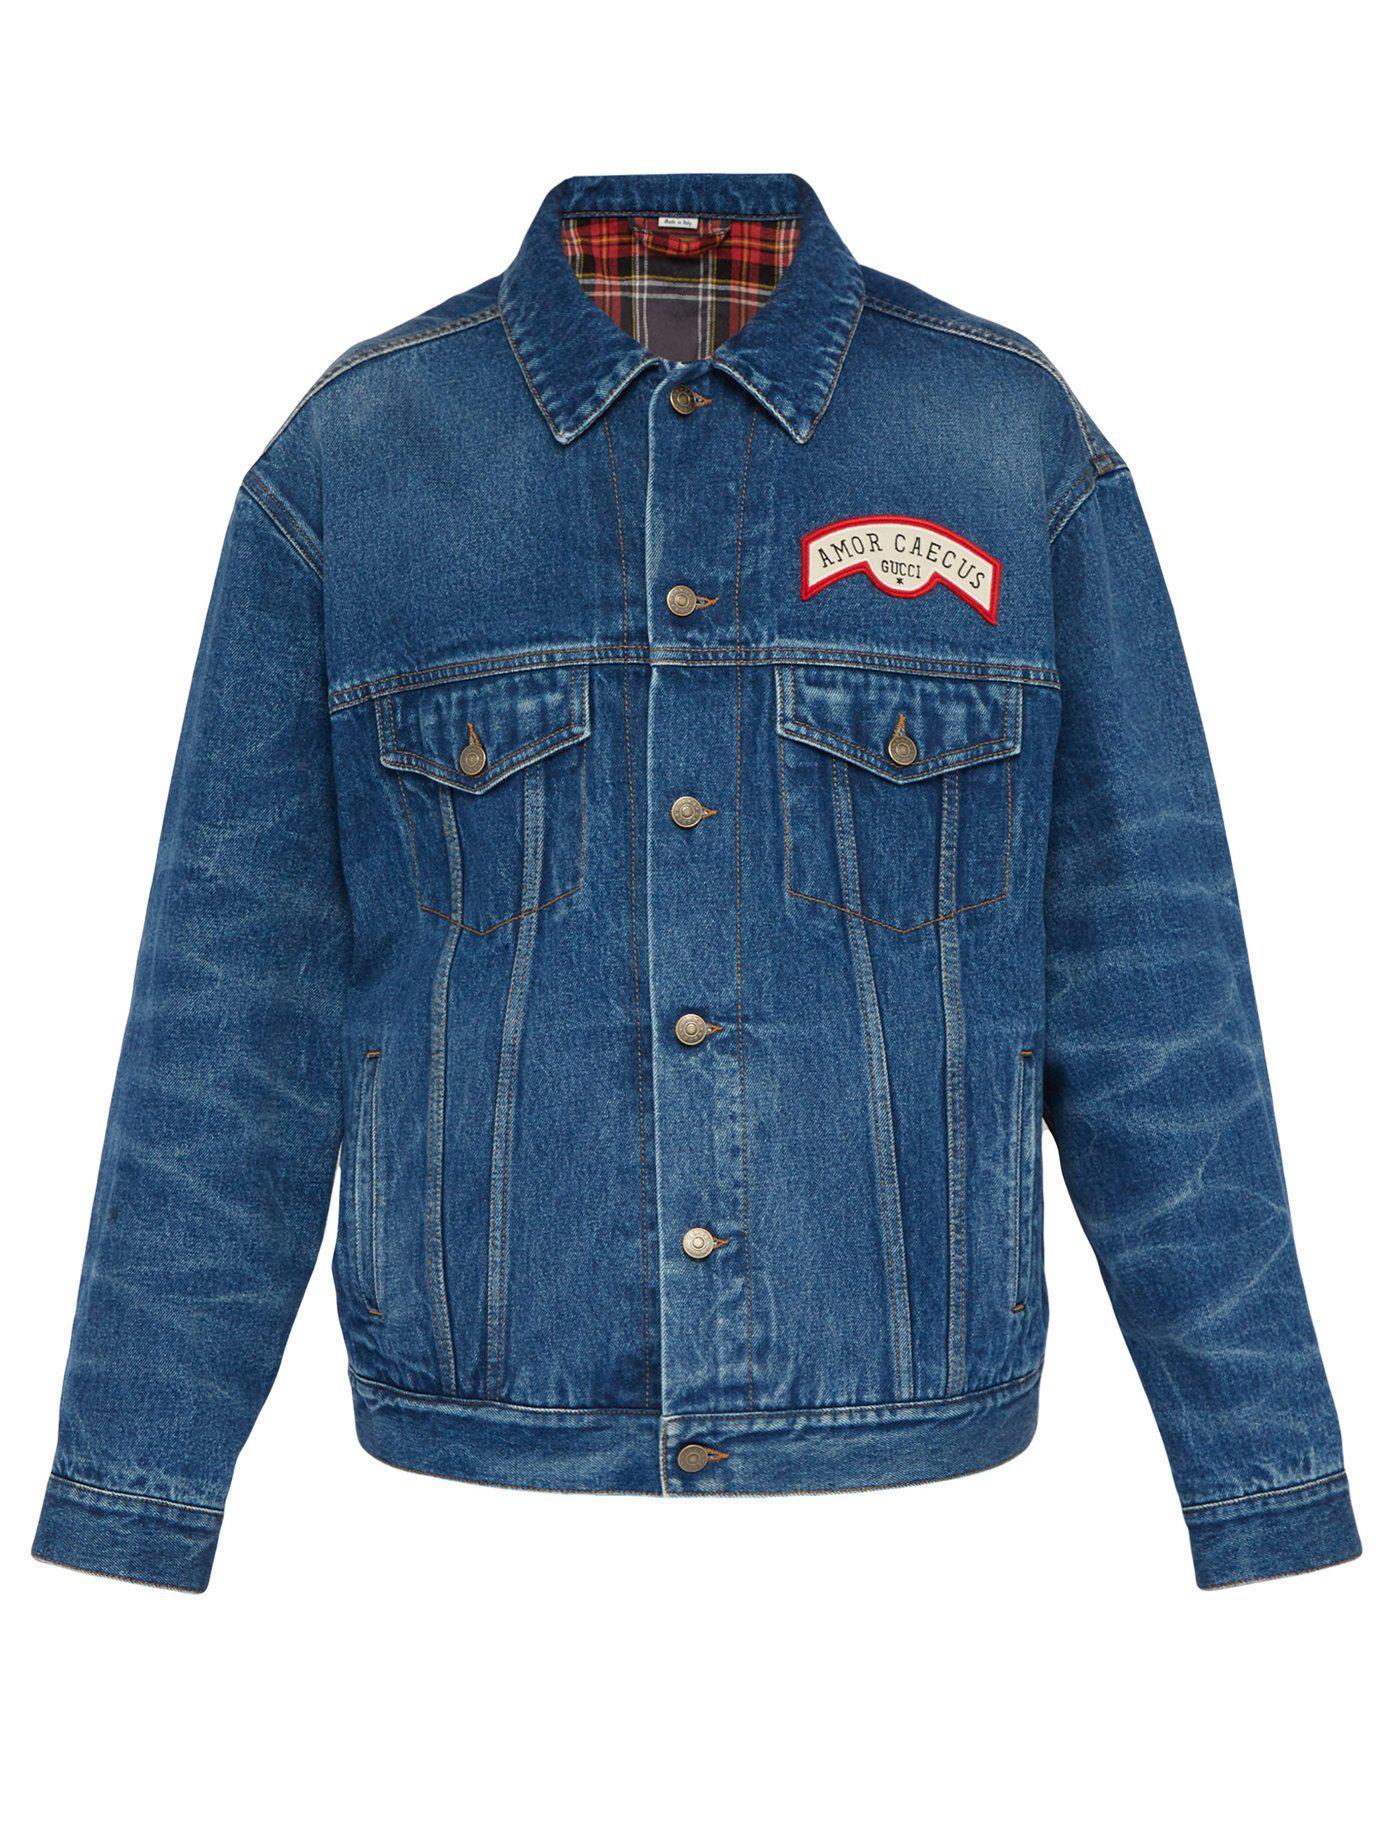 f636e8d4394 Gucci - Blue Oversized Appliquéd Denim Jacket for Men - Lyst. View  fullscreen